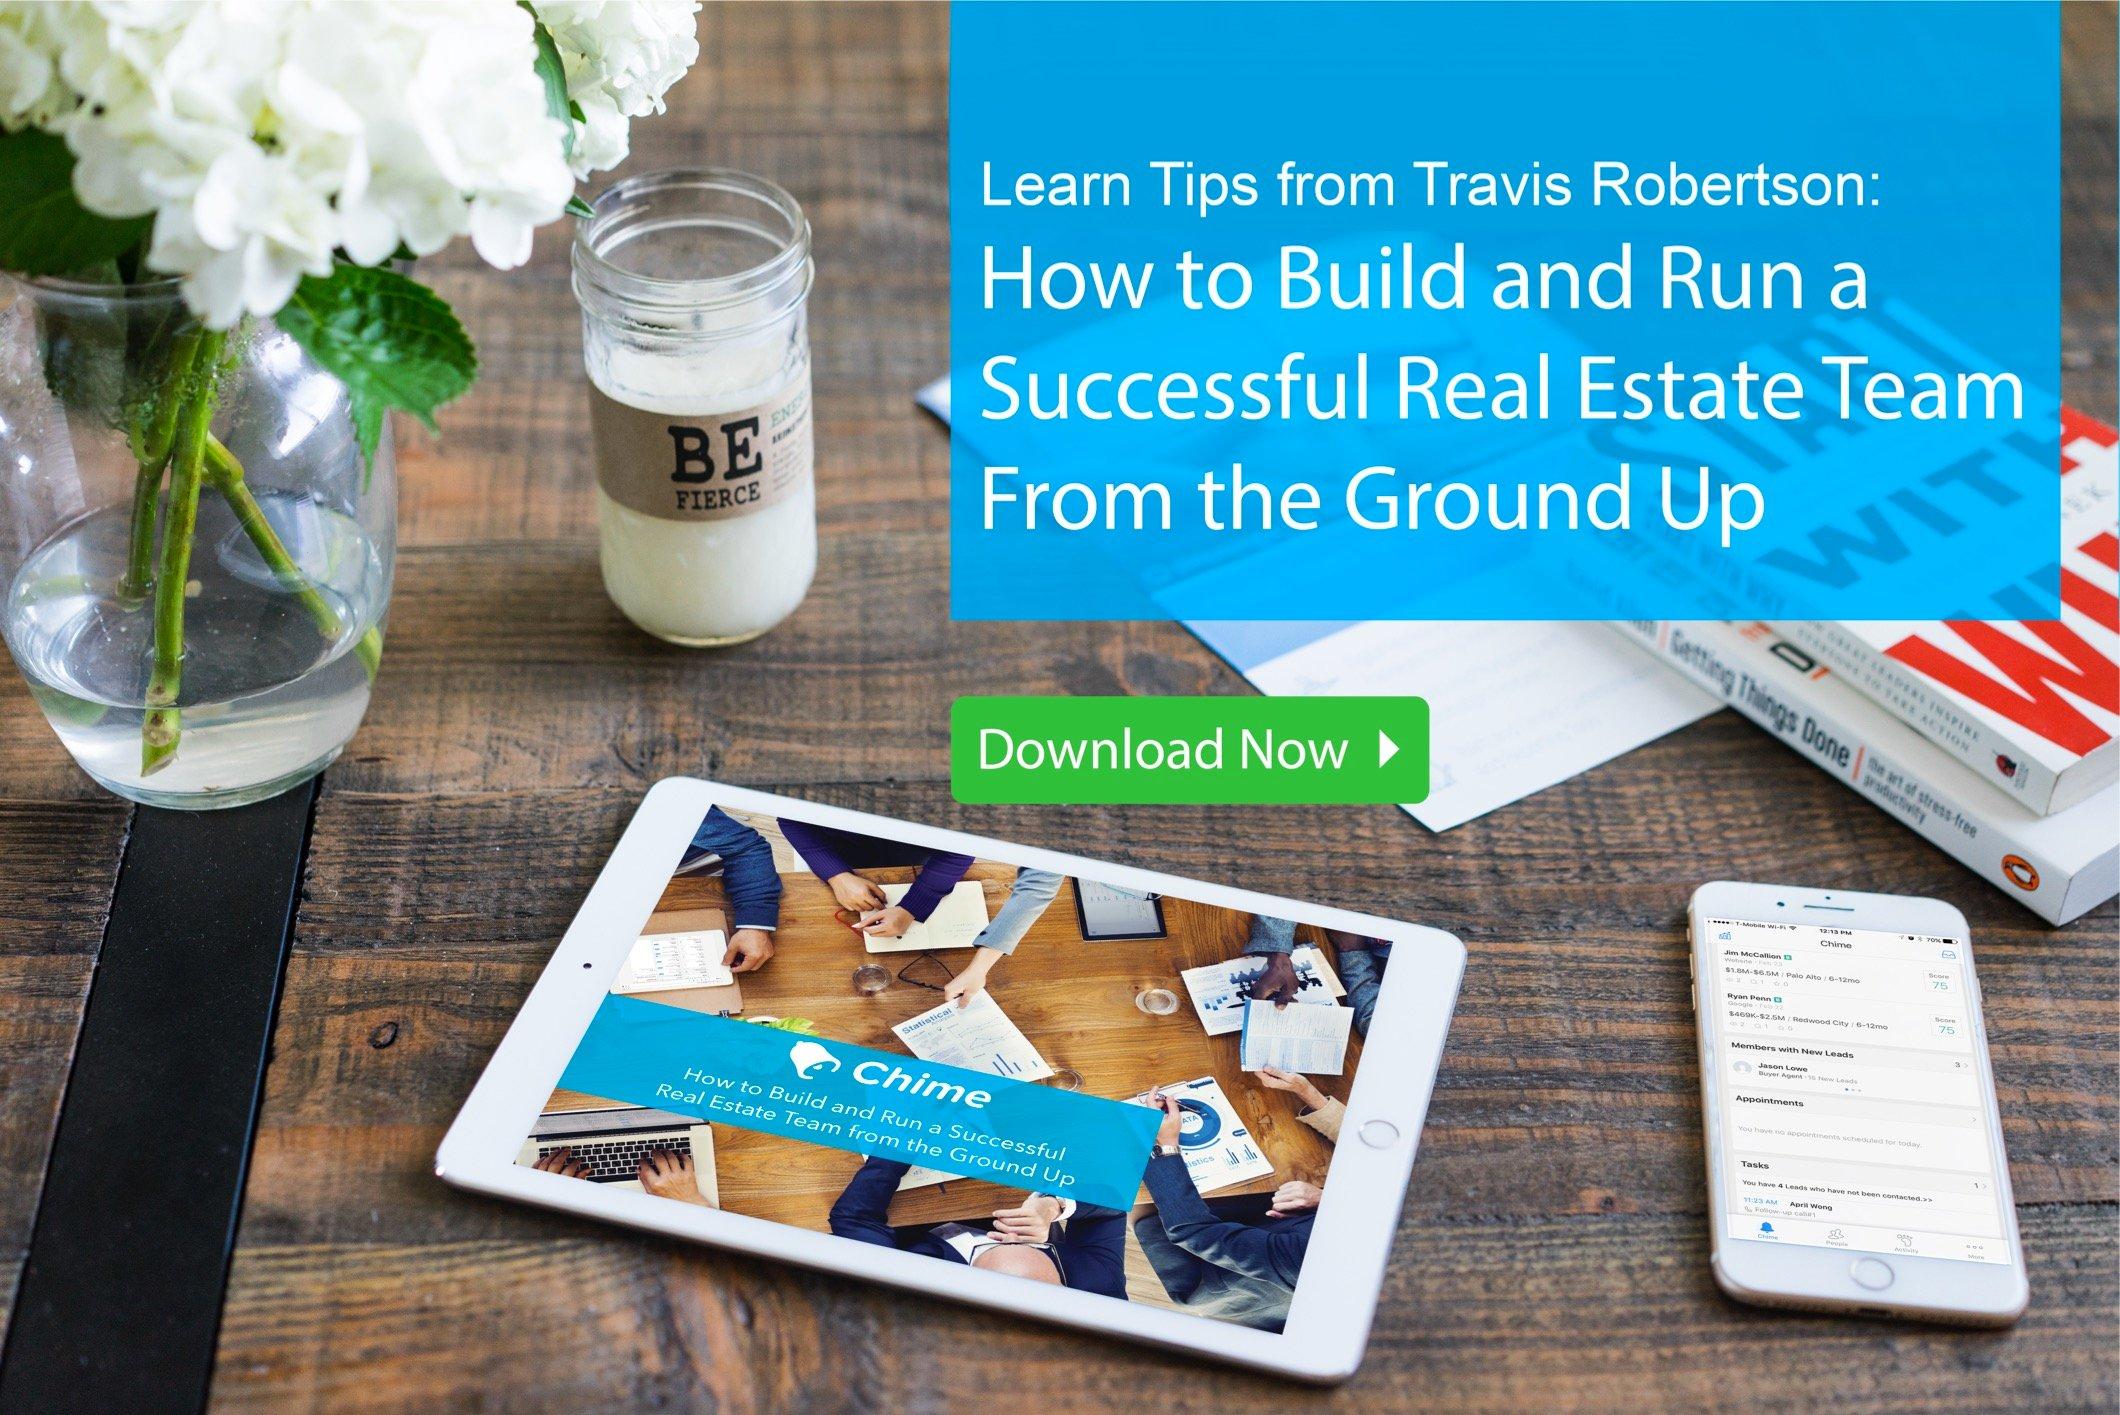 Build a Team eBook cover.jpg